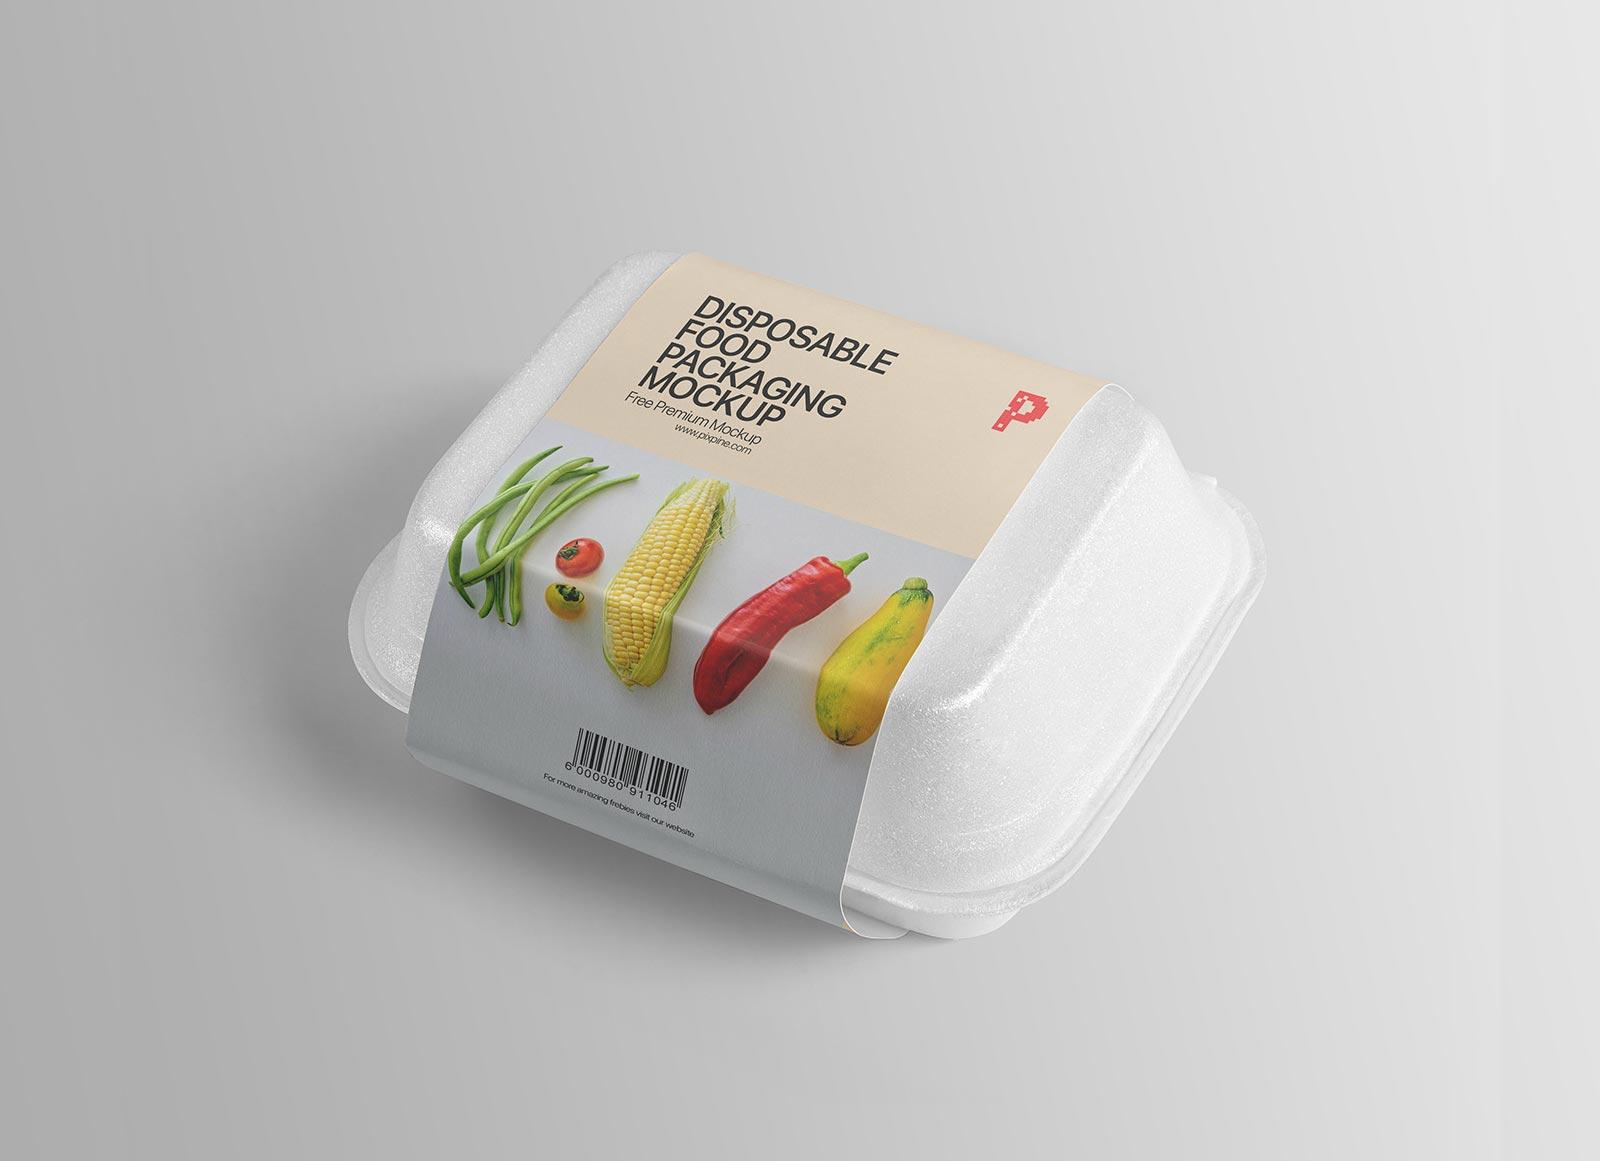 Free-Disposable-Take-Away-Food-Packaging-Mockup-PSD